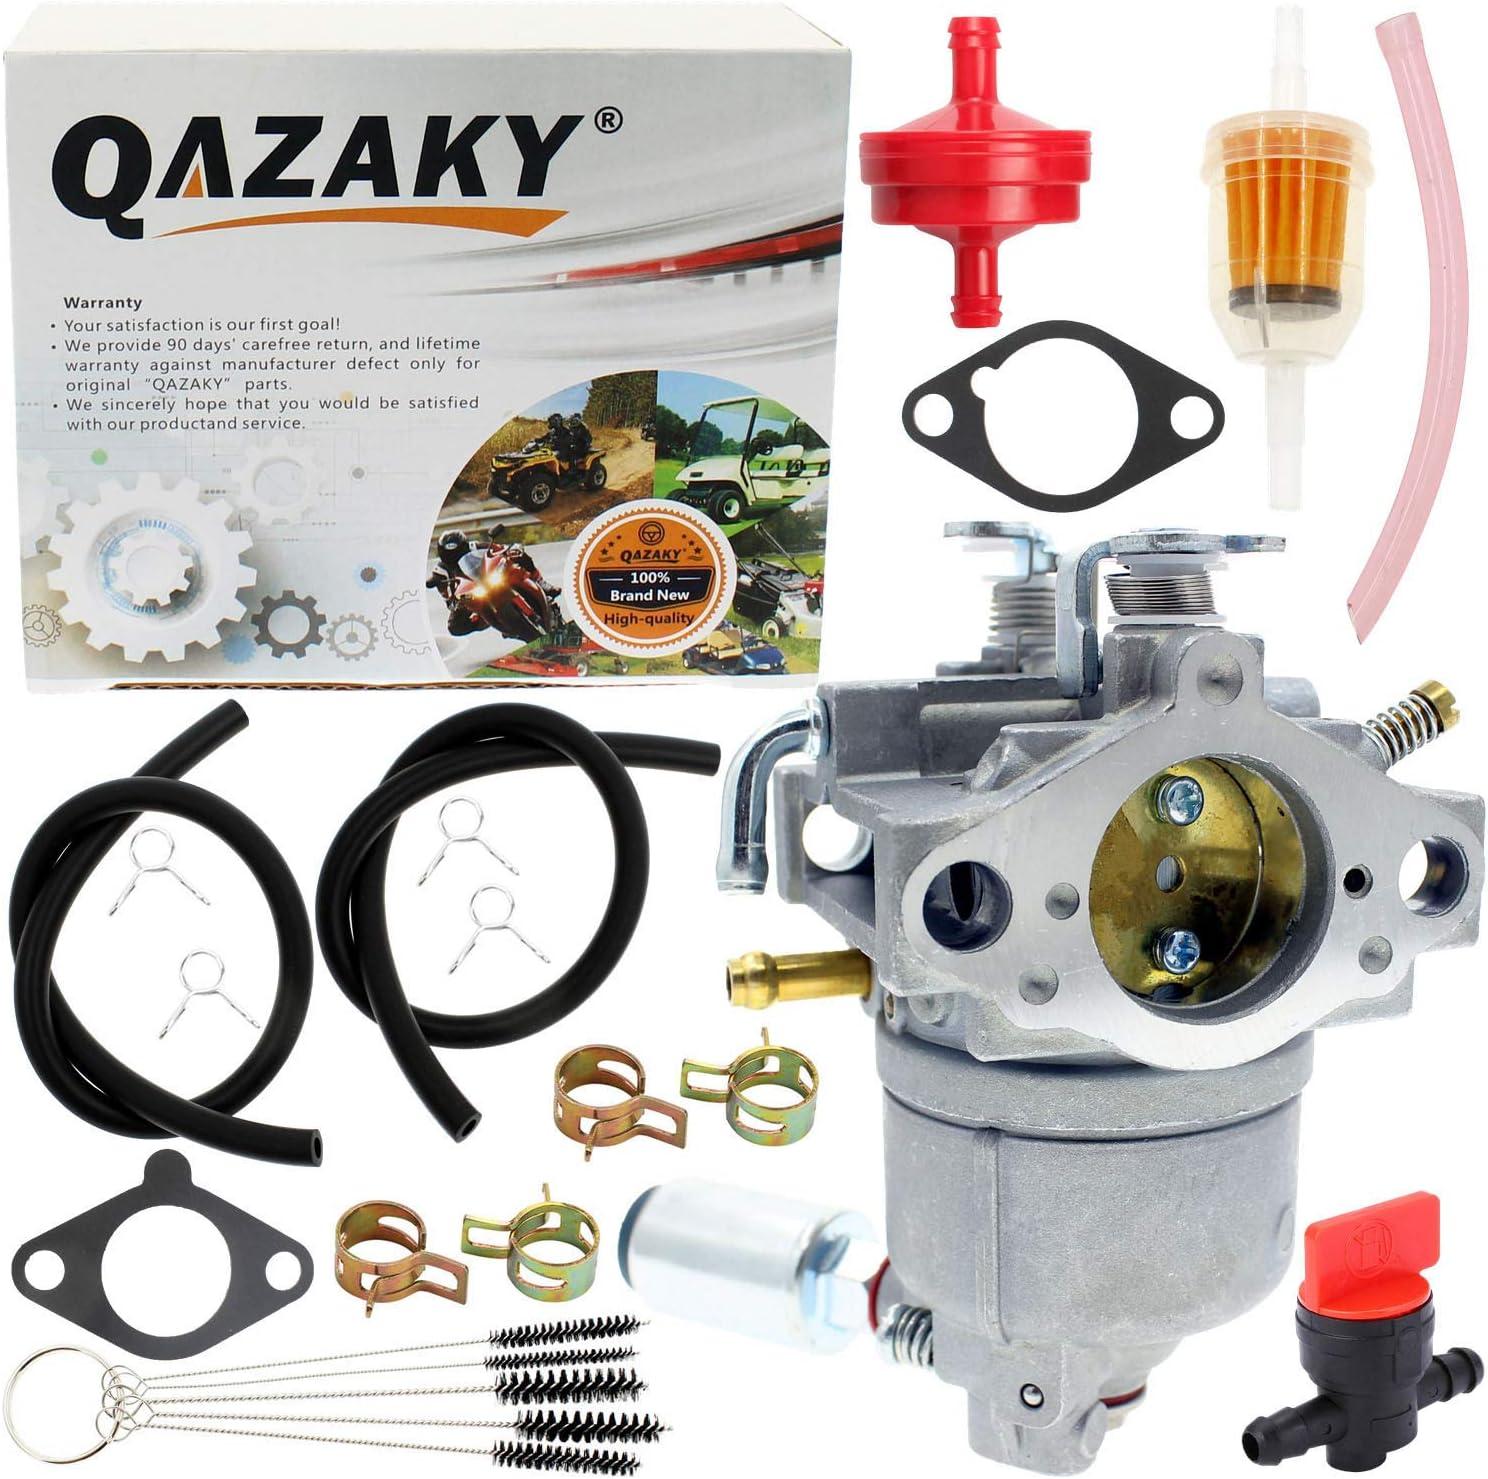 QAZAKY Carburetor Compatible with AM109205 Lawn Garden Tractor 170 175 240 245 260 265 285 320 32124 F510 F525 GT242 GT262 GT275 LX170 LX172 LX175 LX178 LX186 LX188 LX240 Kawasaki 15003-2398 FC401V